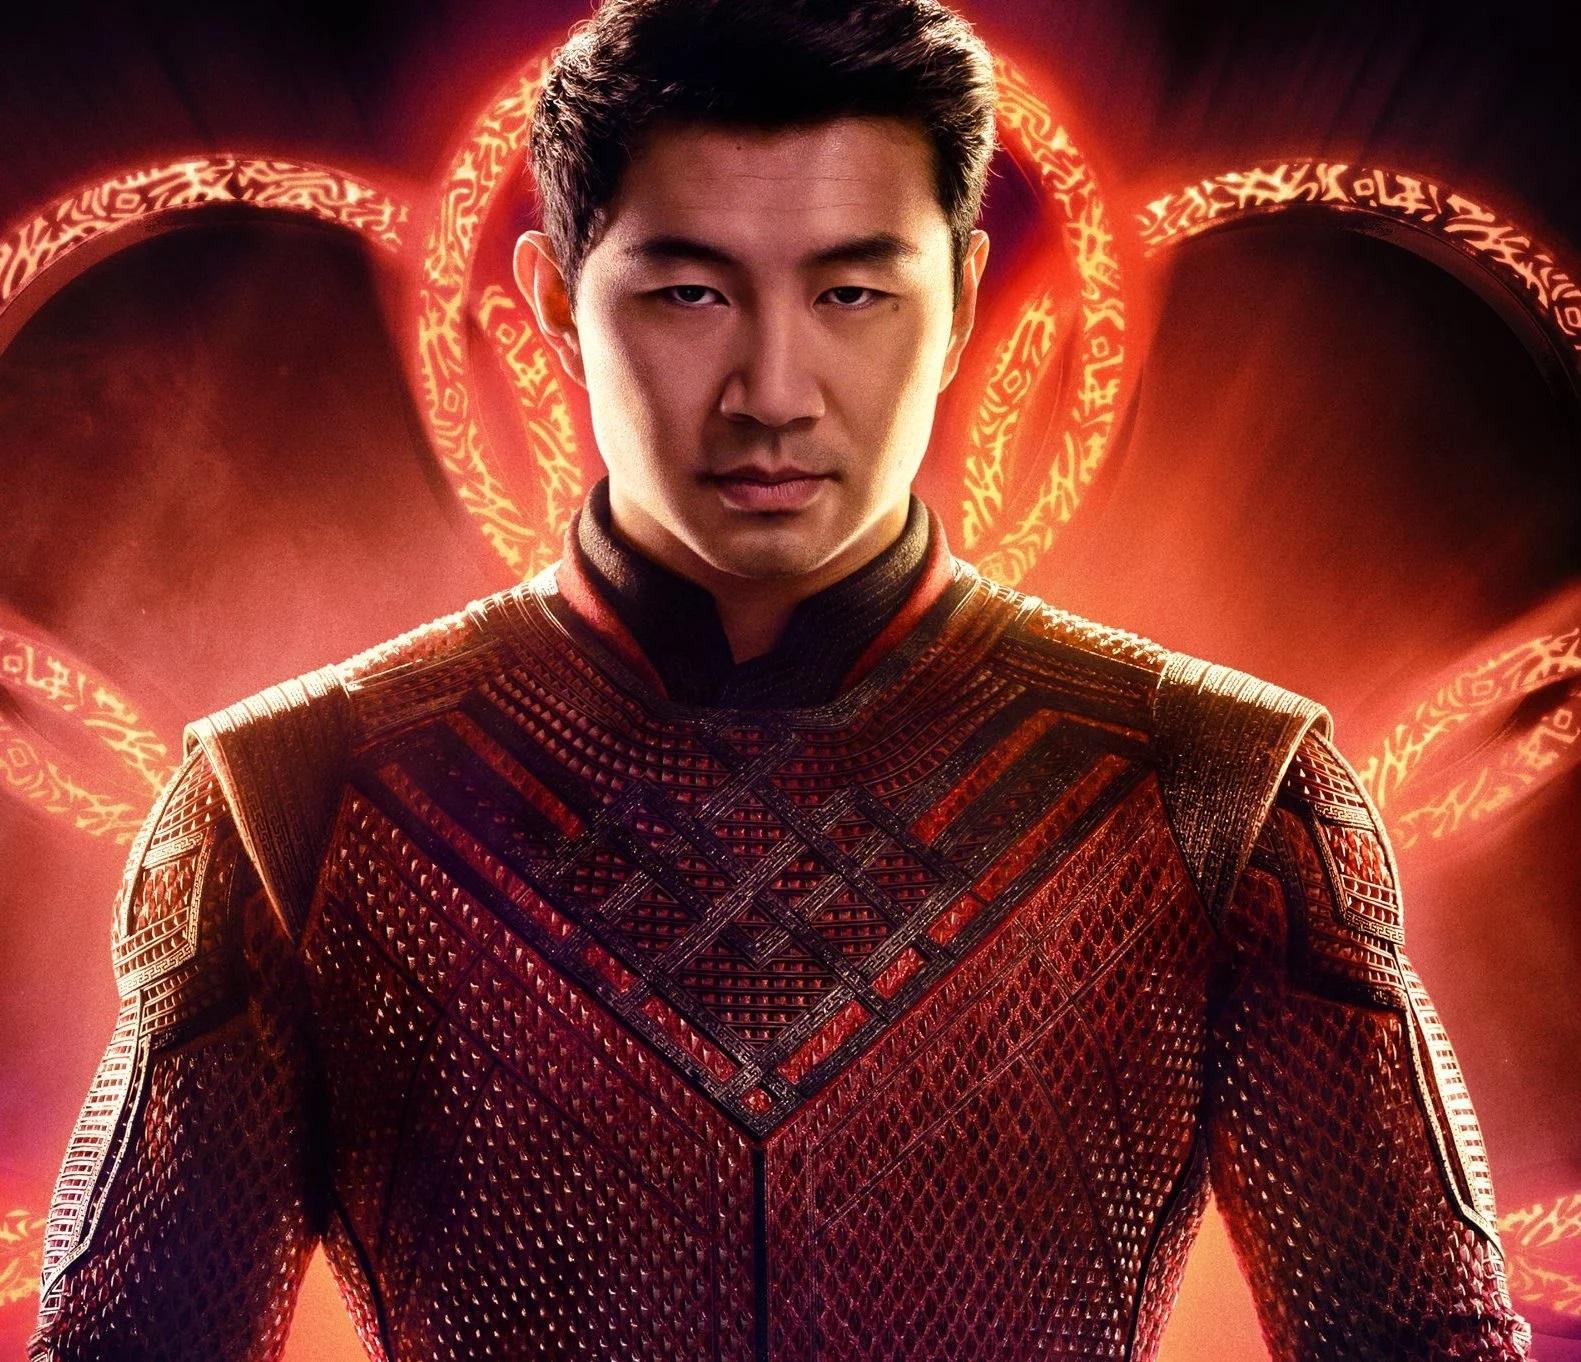 shang chi trailer ufficiale